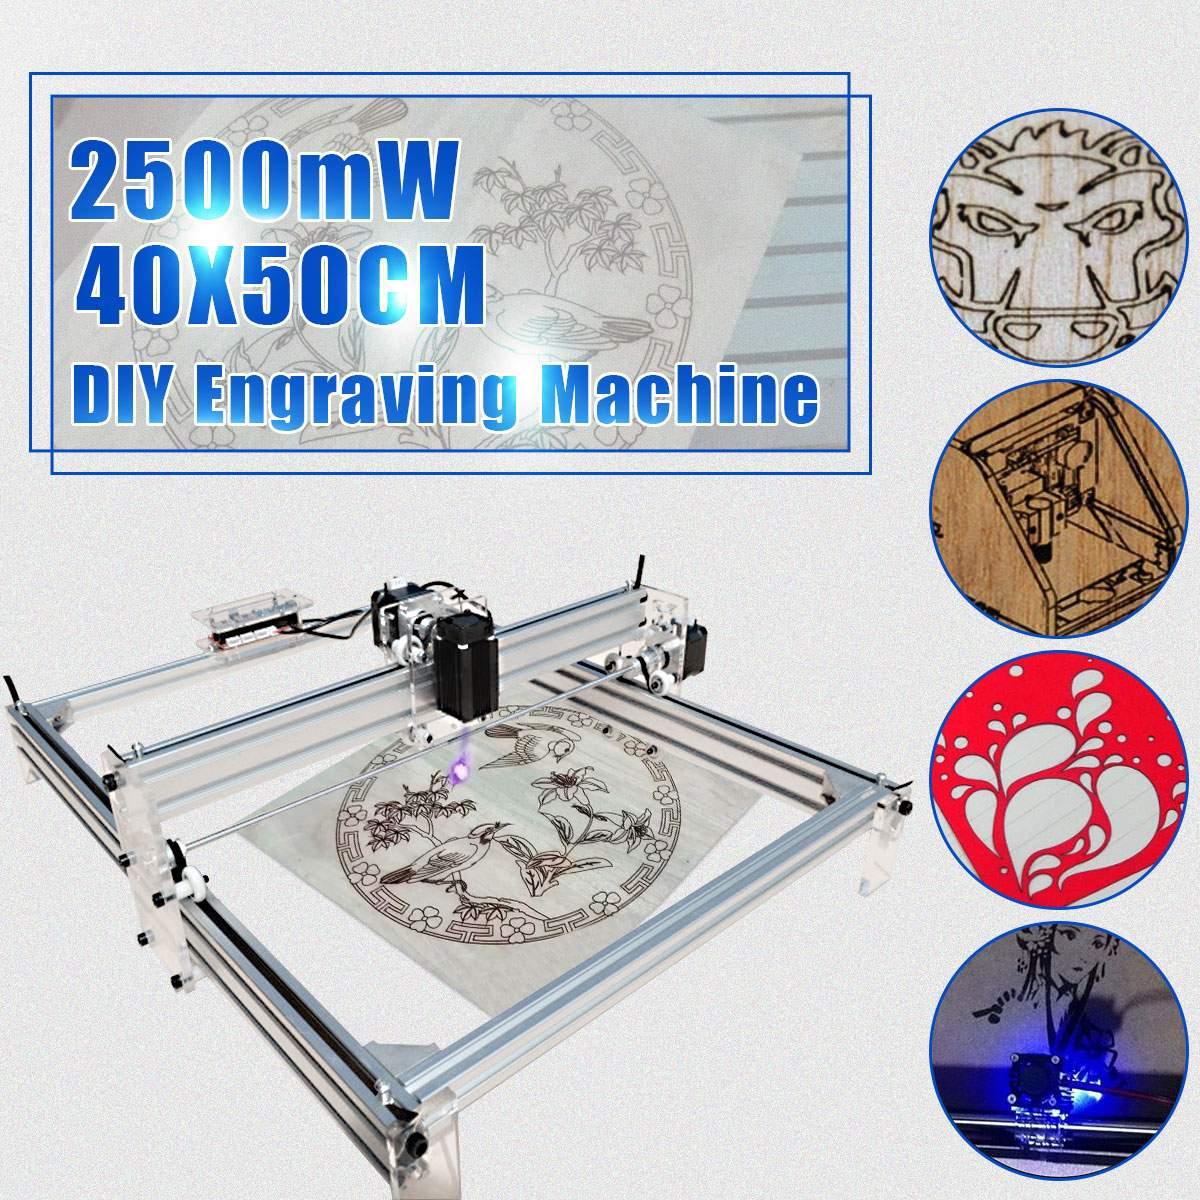 2500MW Mini Laser Engraving Machine 40*50cm 12V DIY Desktop Mini Wood RouterCutting/Engraving Machine With Laser Goggles